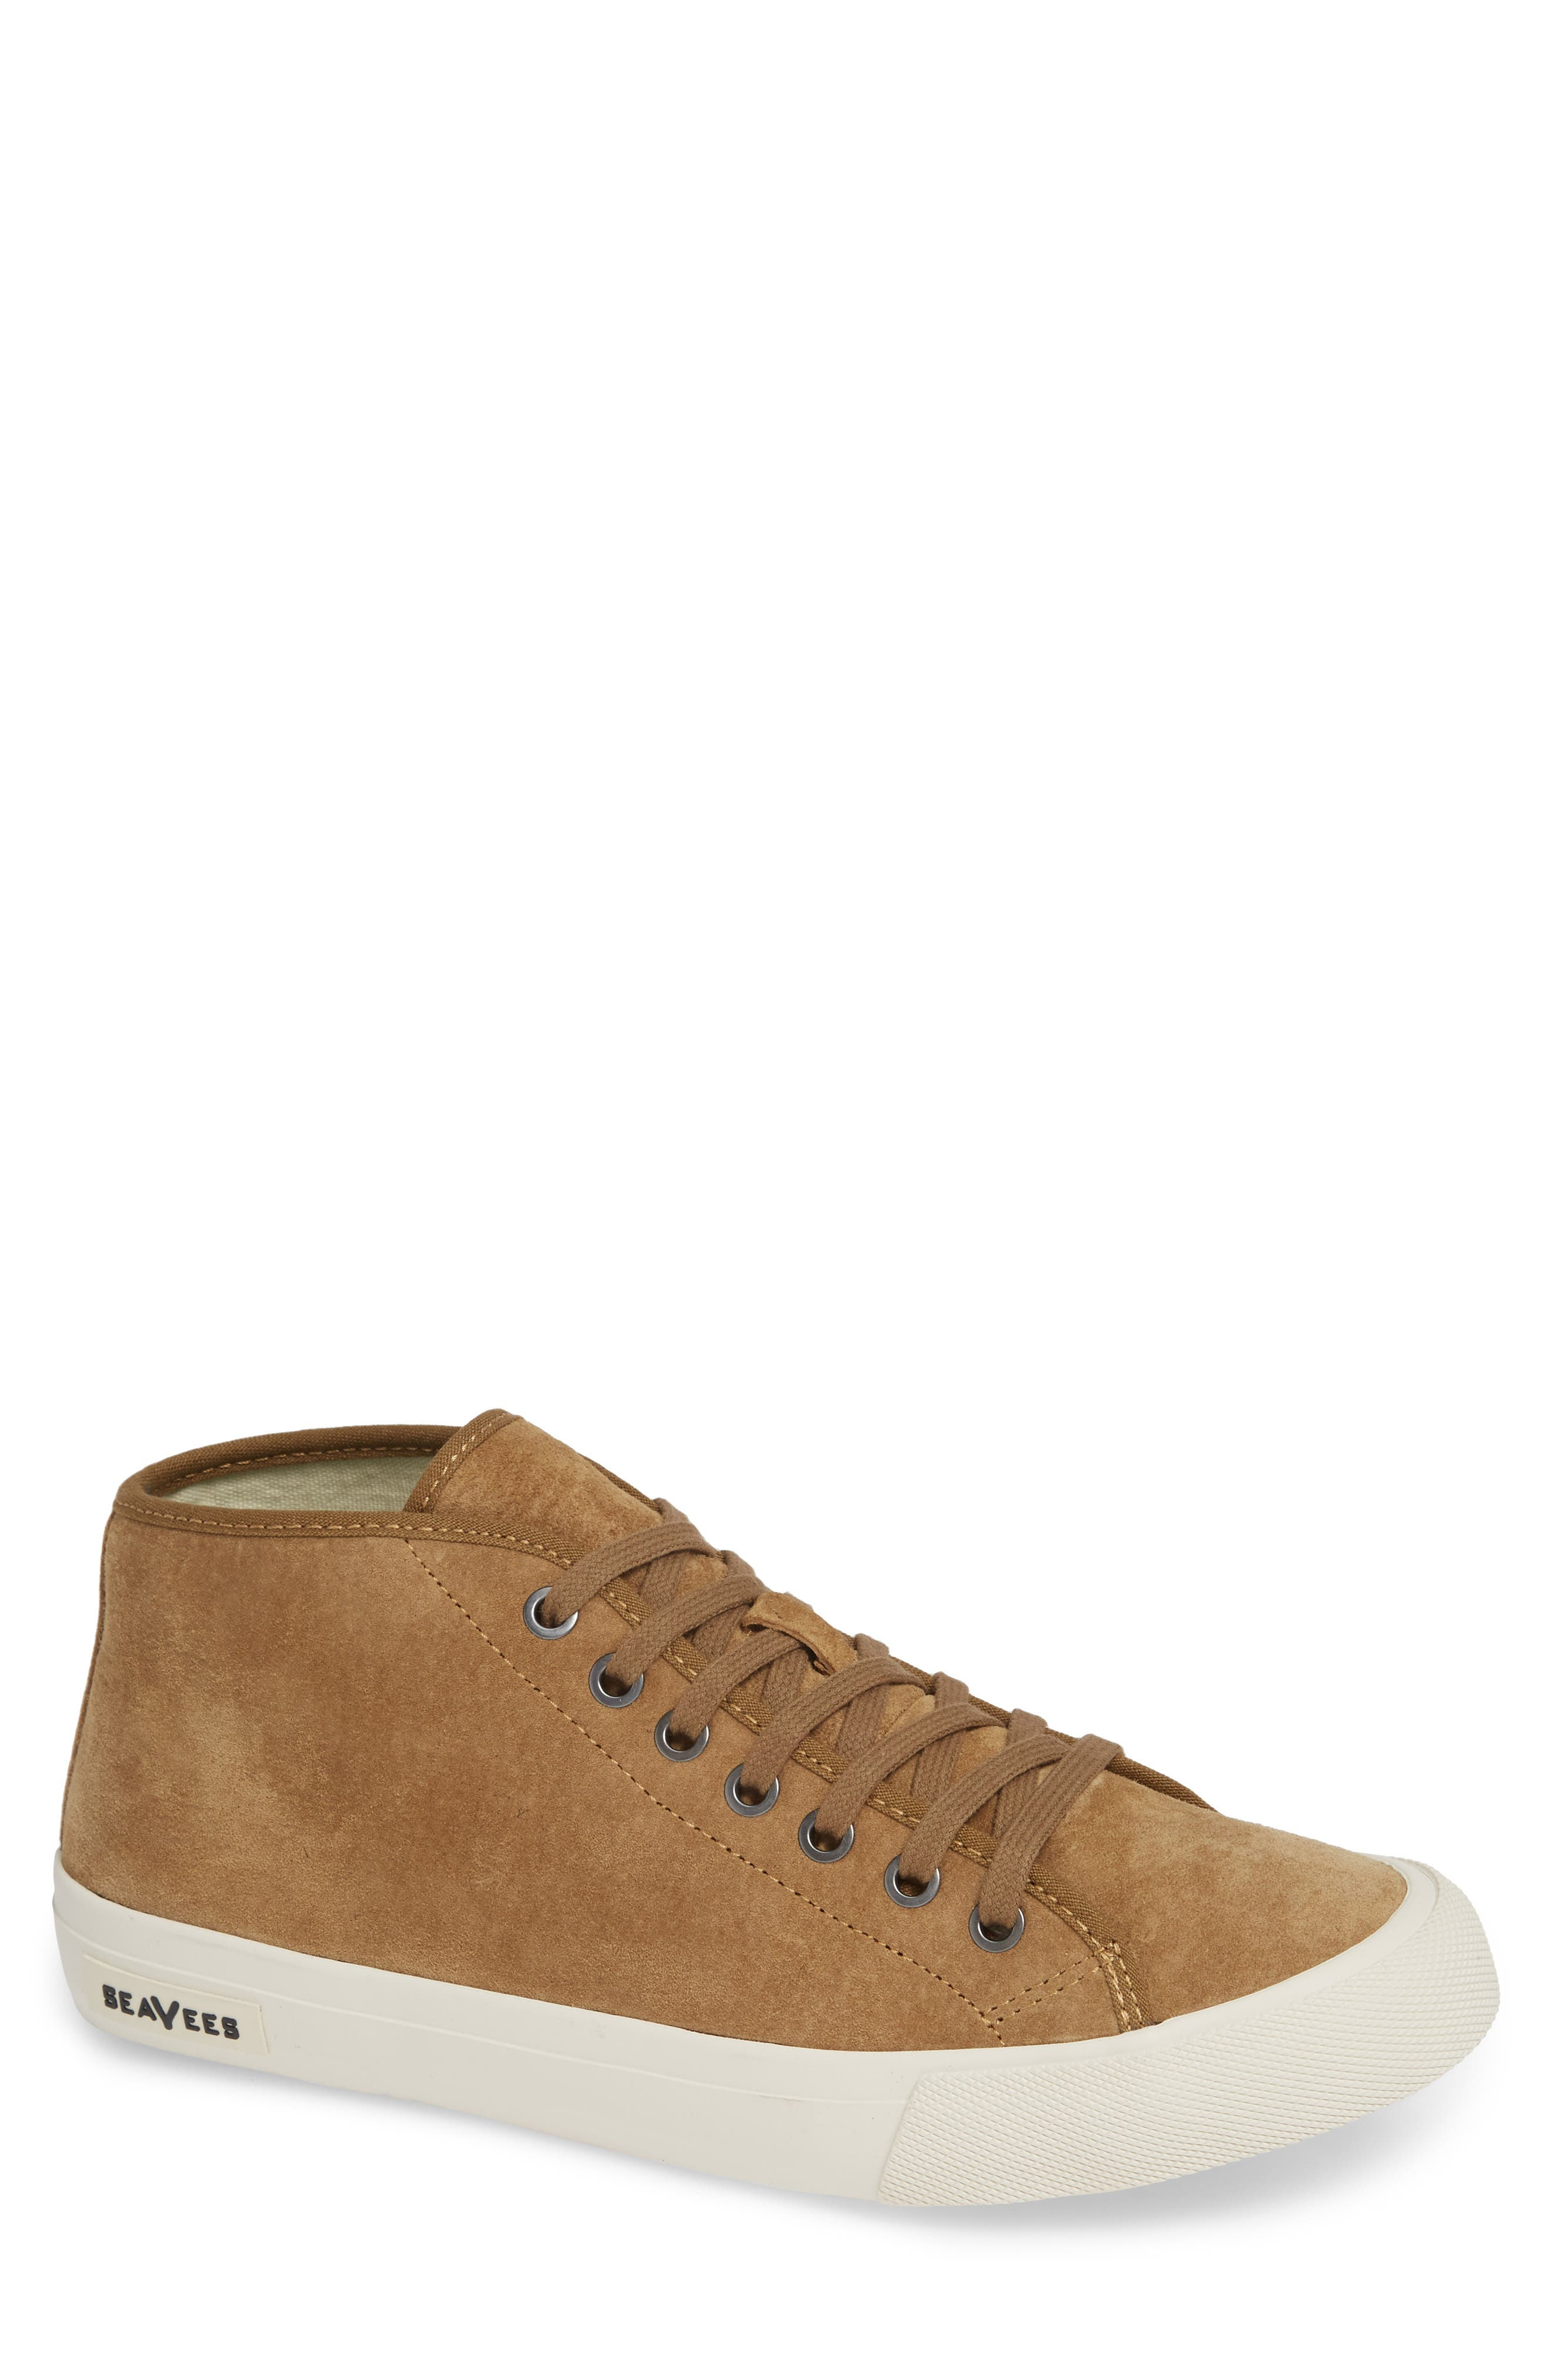 California Special Sneaker,                         Main,                         color, DESERT SUEDE